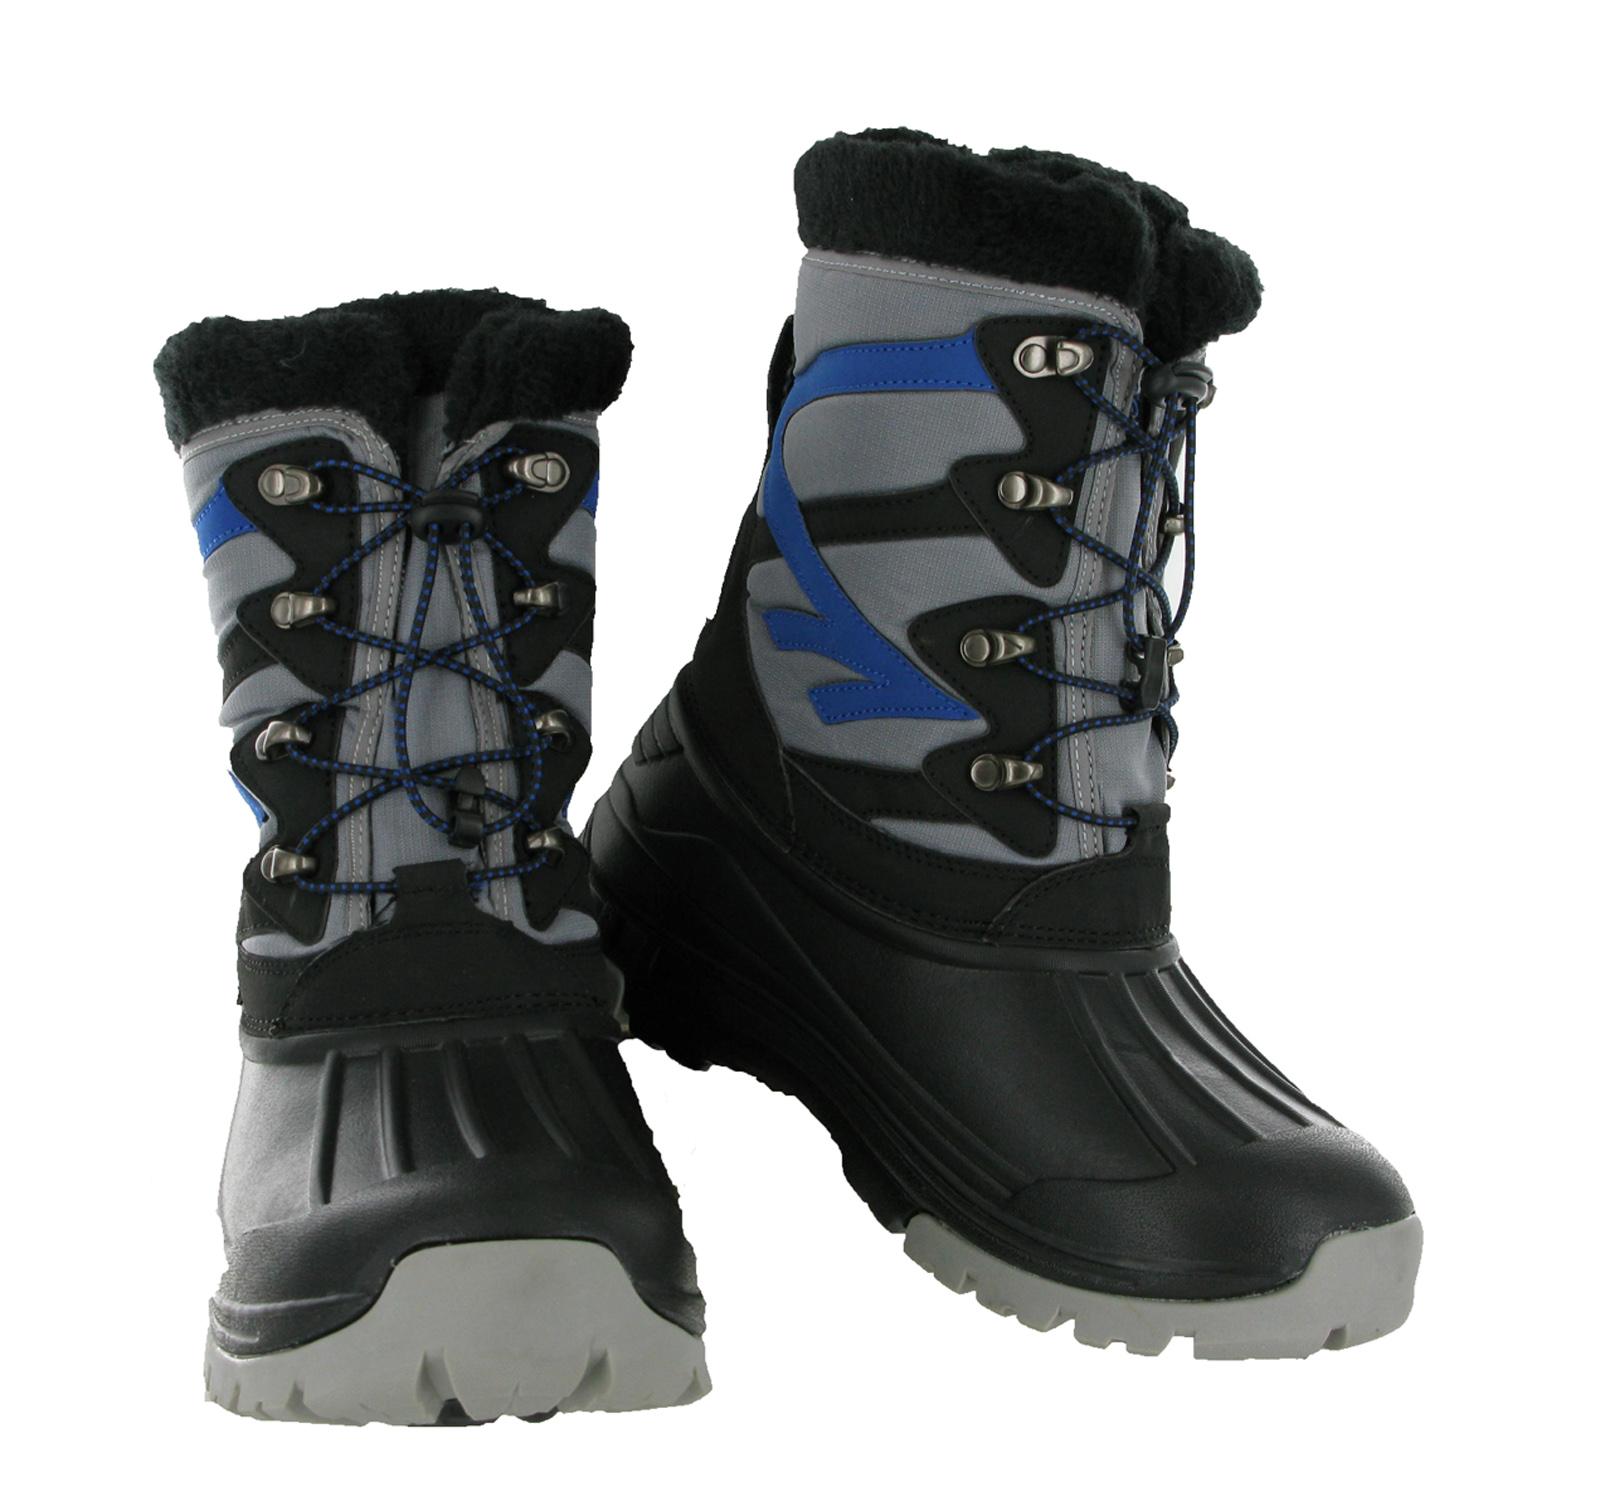 New Boys Hi-Tec Avalanche Lightweight Winter Warm Comfy